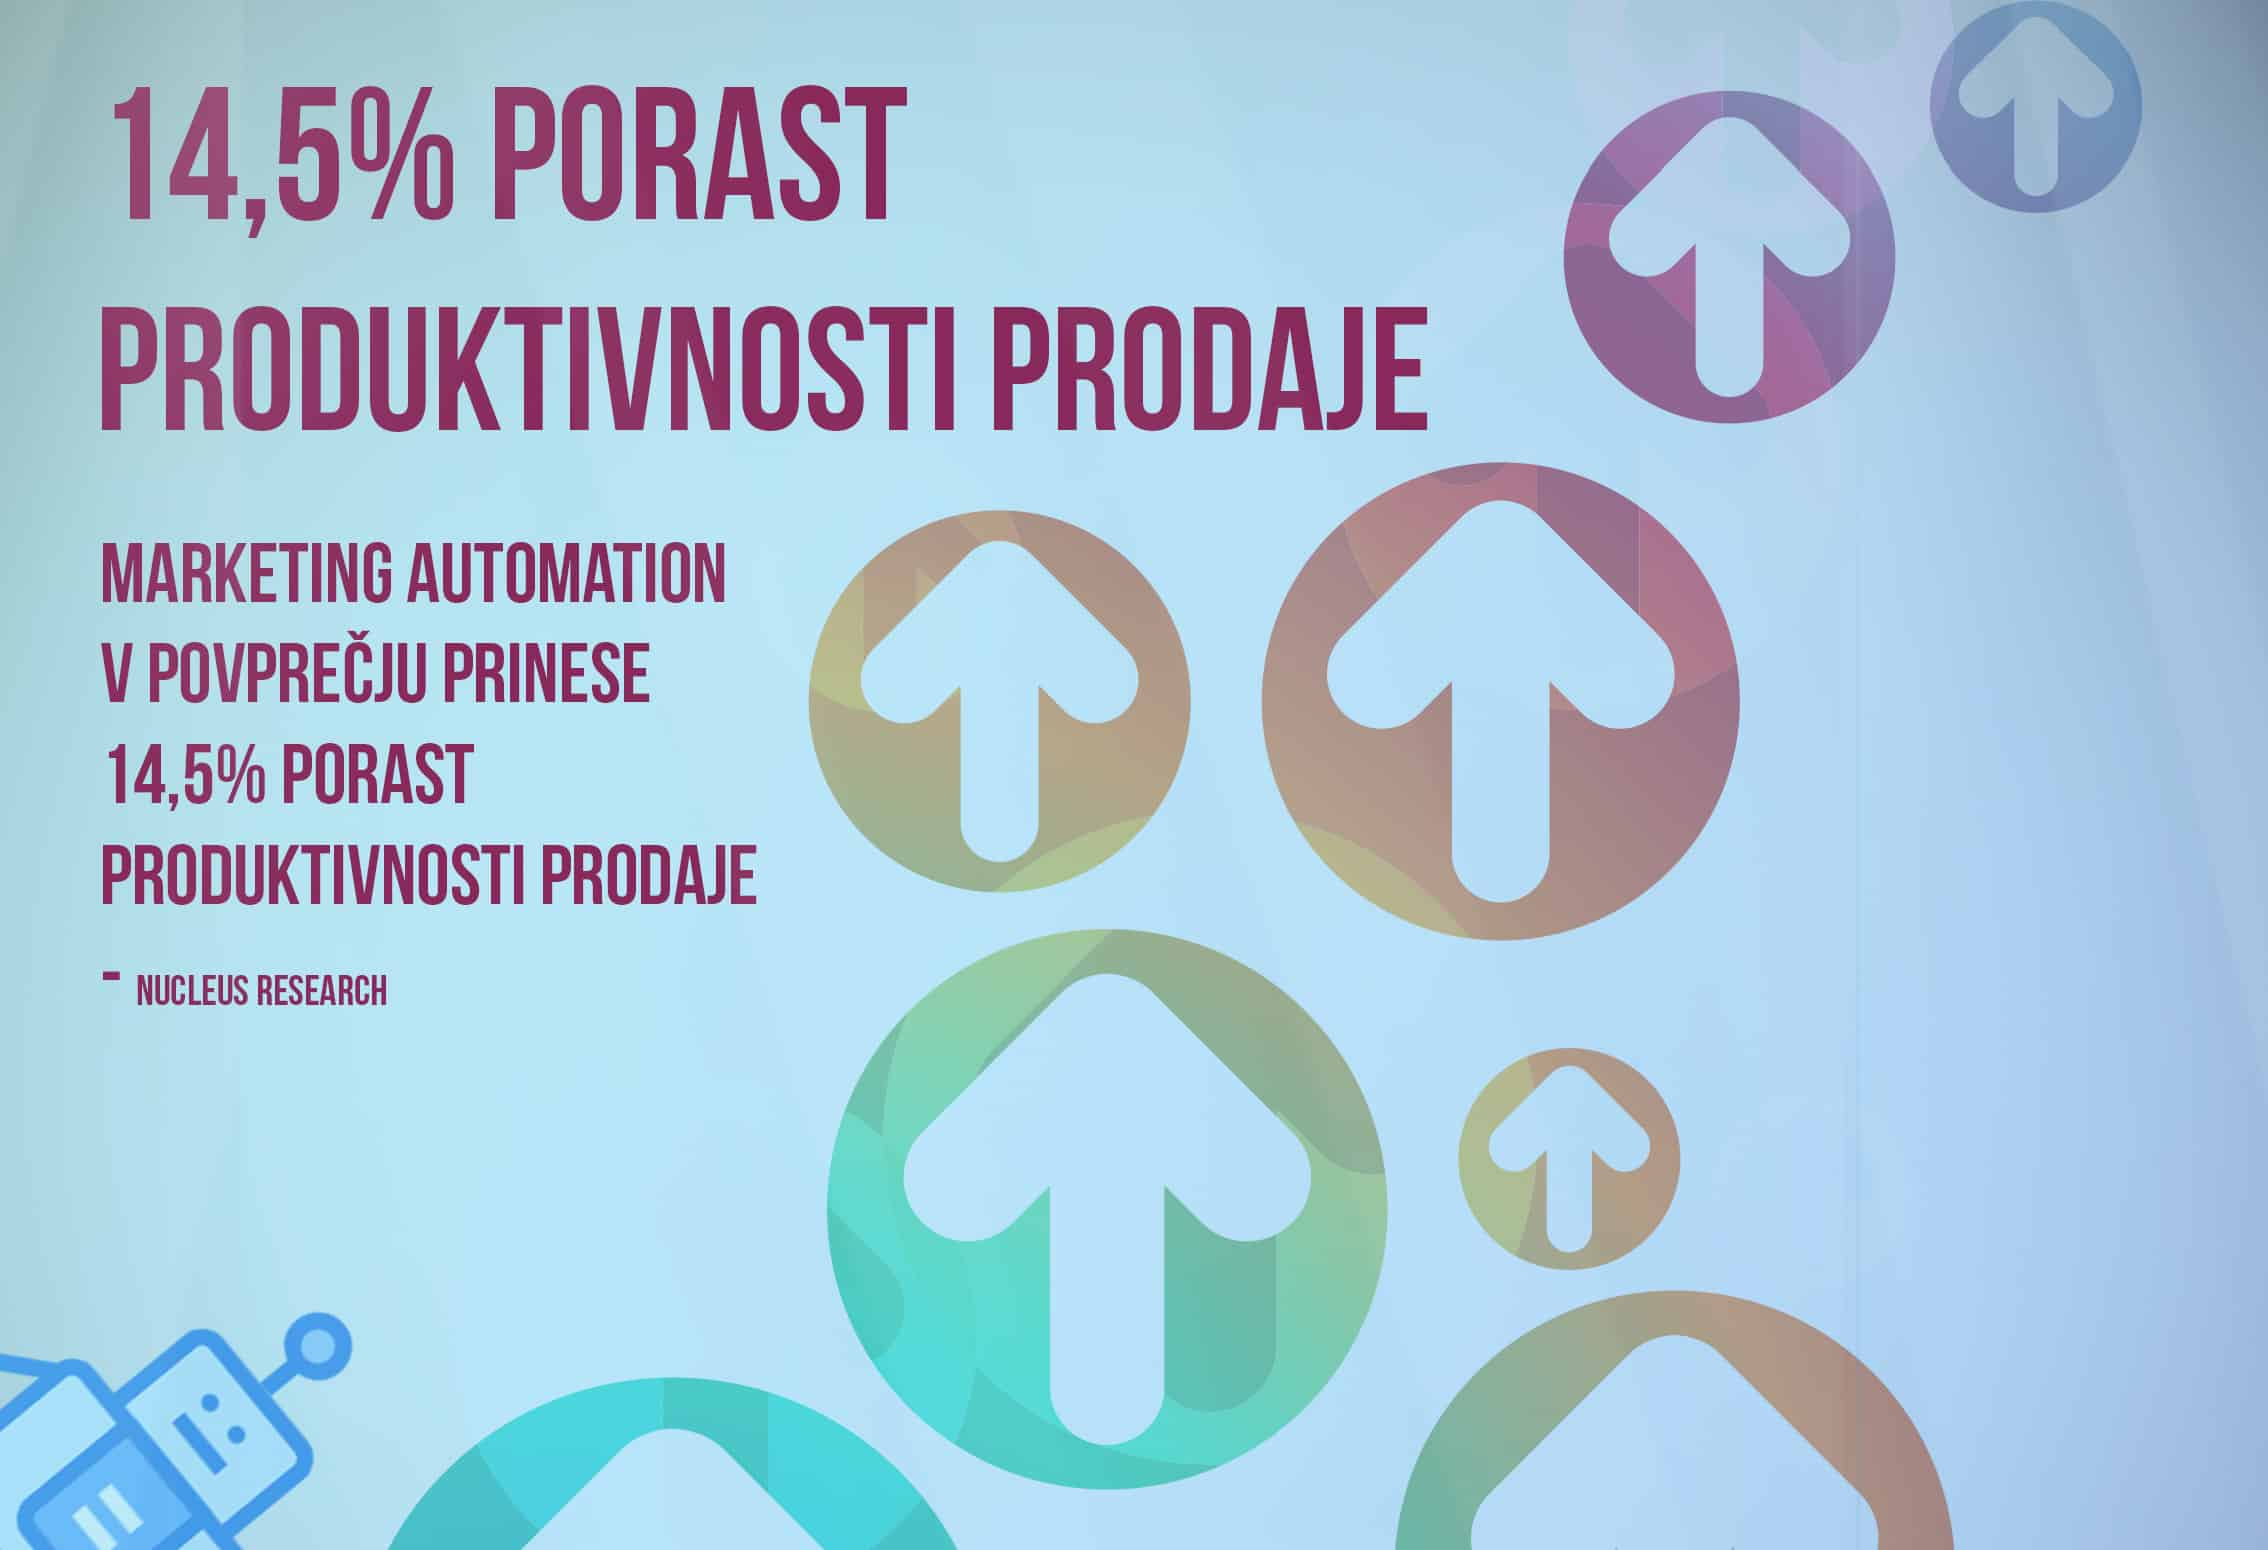 Positiva_Marketing_Automation